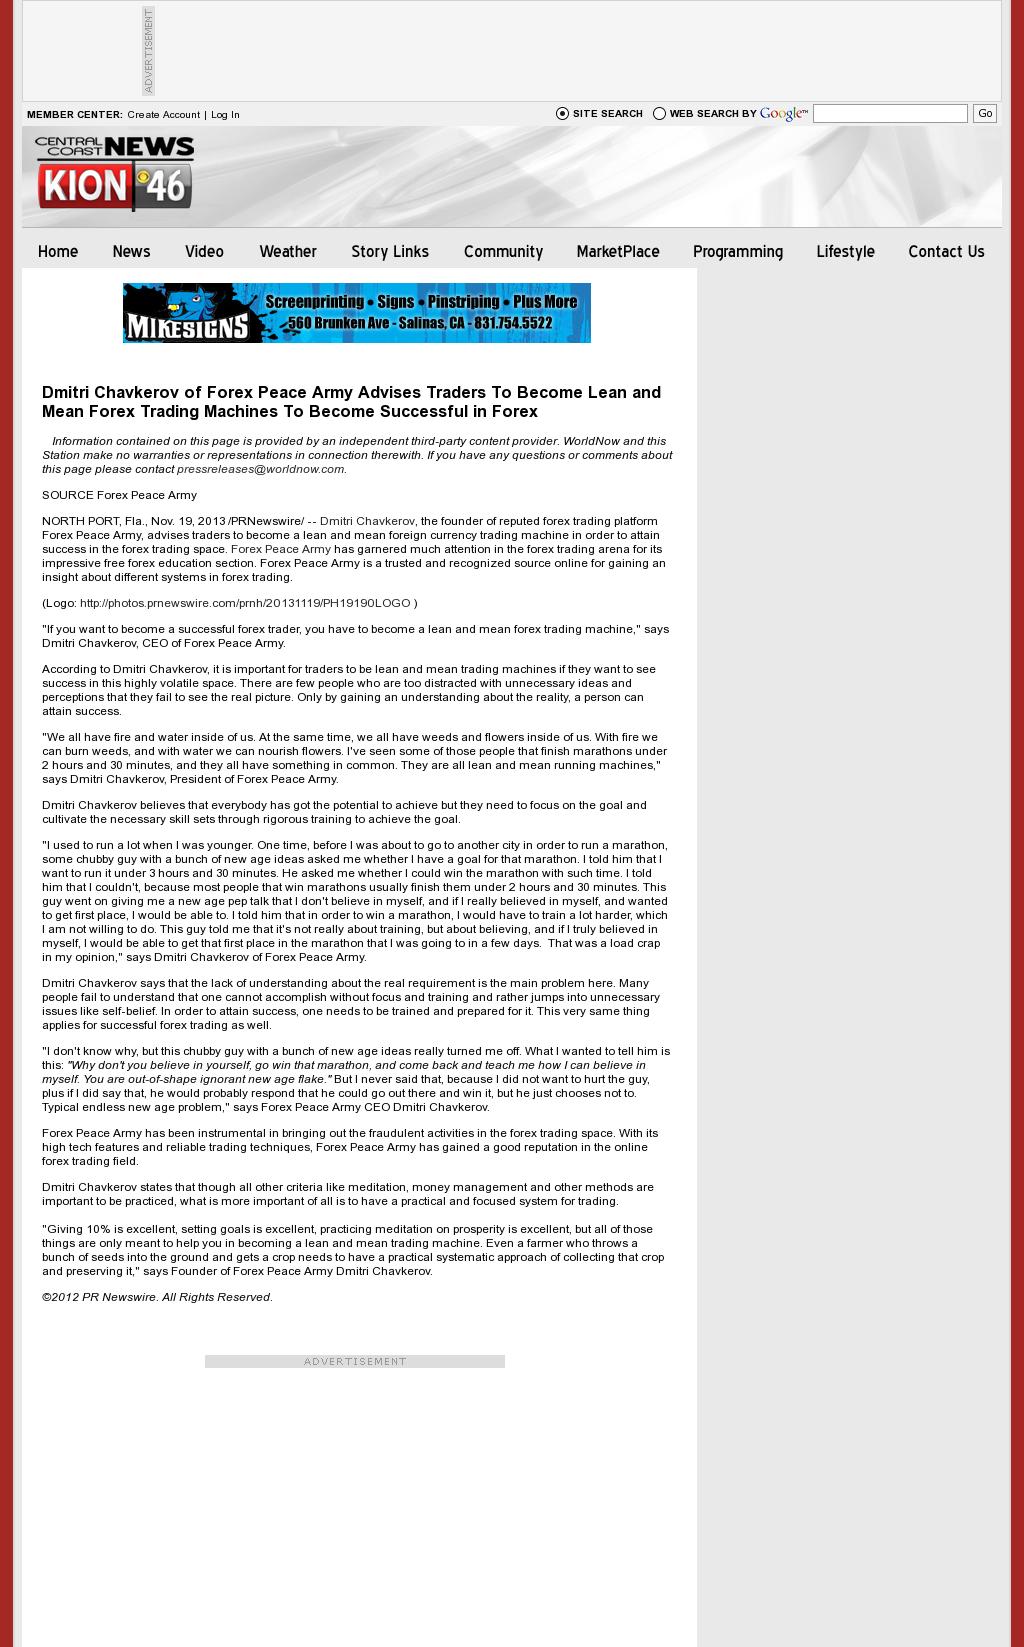 Dmitri Chavkerov - KION CBS-46 (Salinas, CA) - Lean Forex Trading